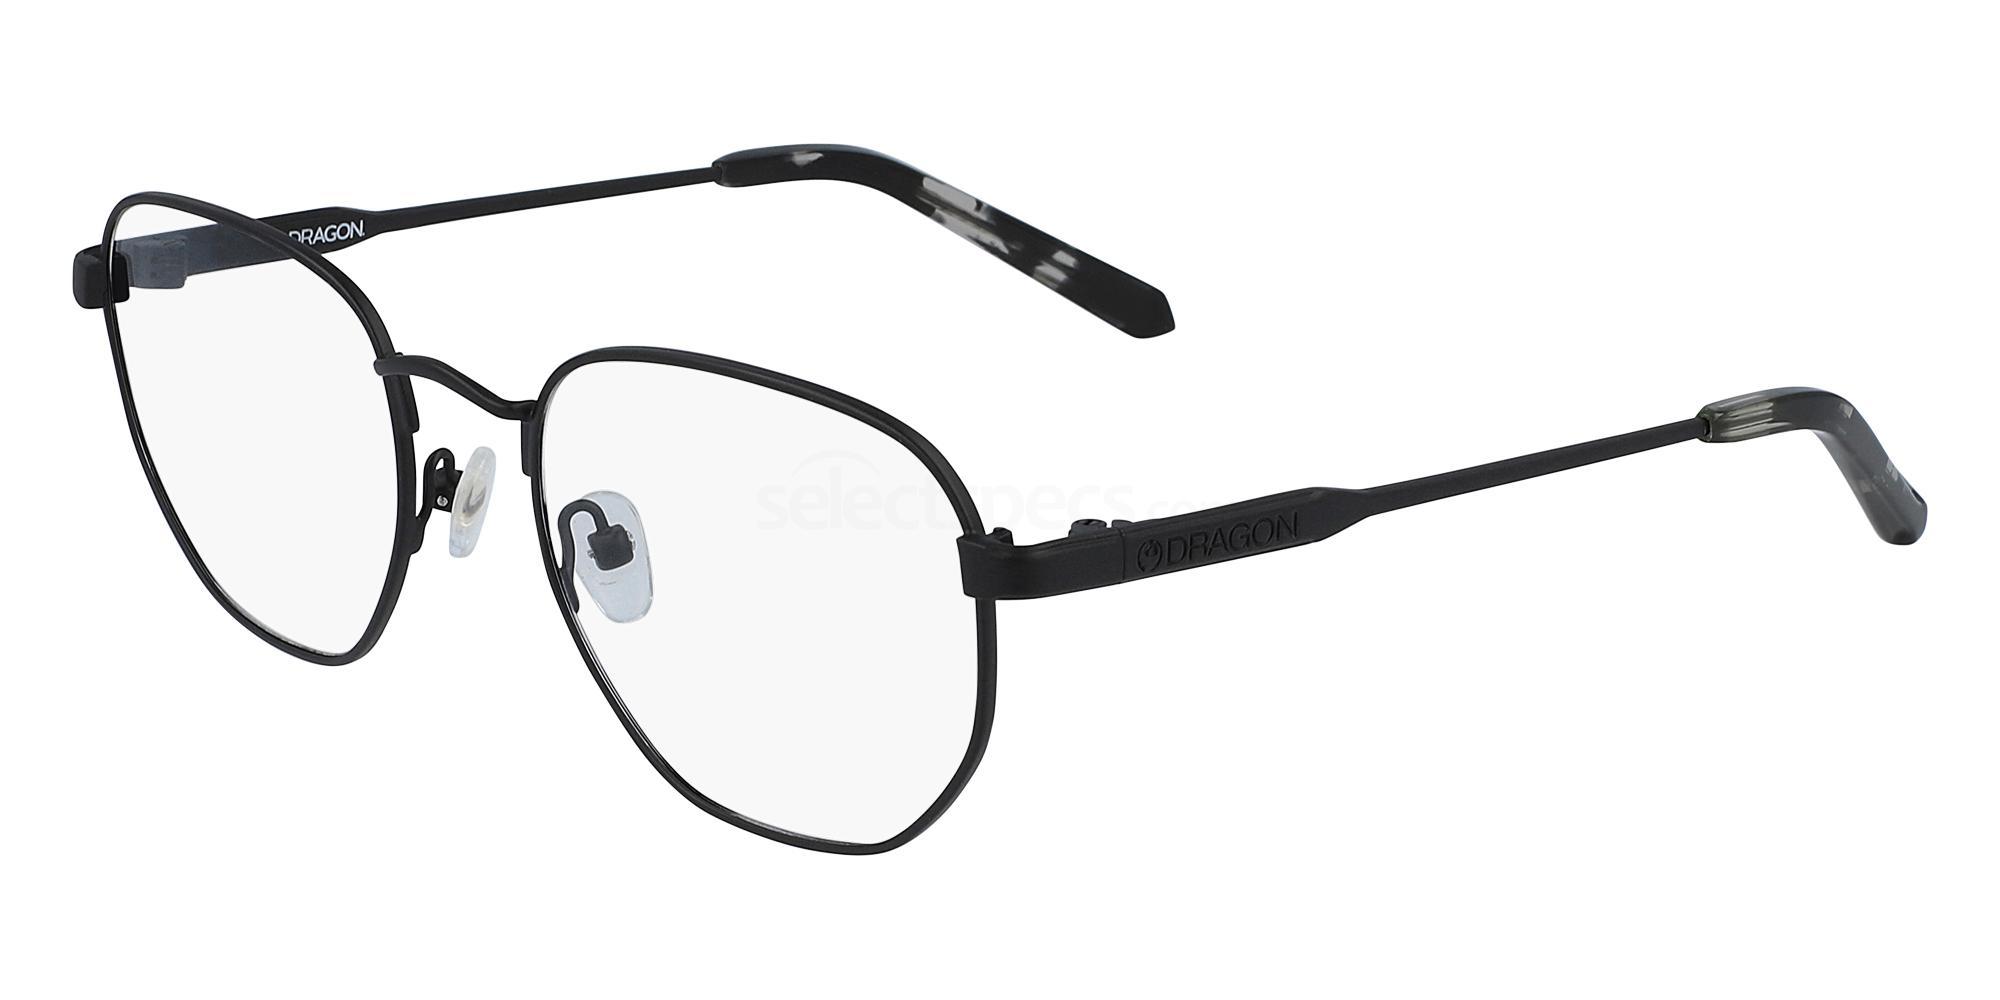 002 DR192 COLE Glasses, Dragon